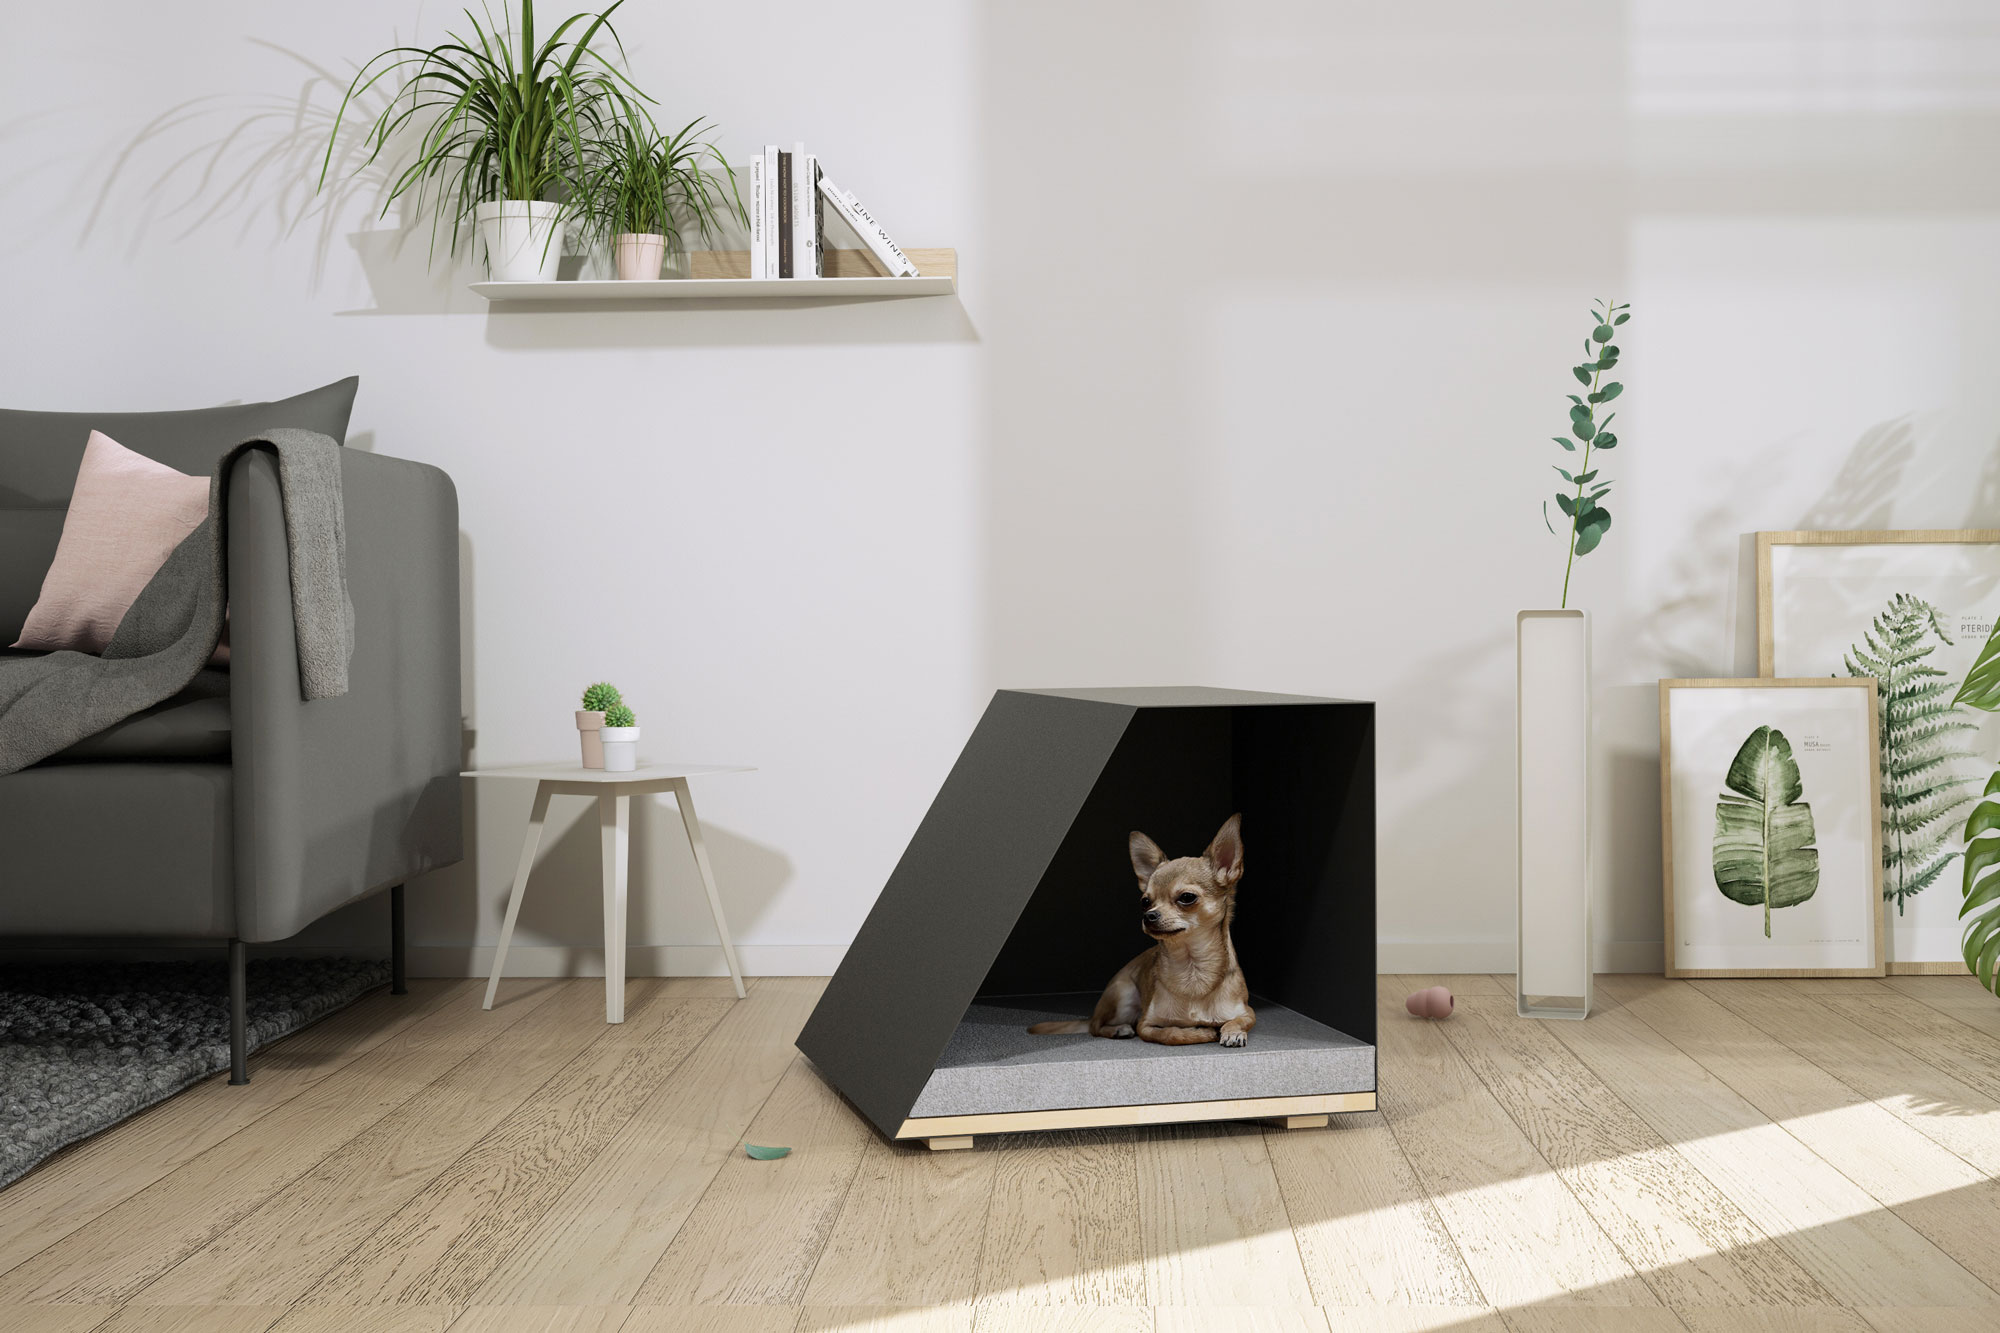 barudesign nac s niche a chien et chat